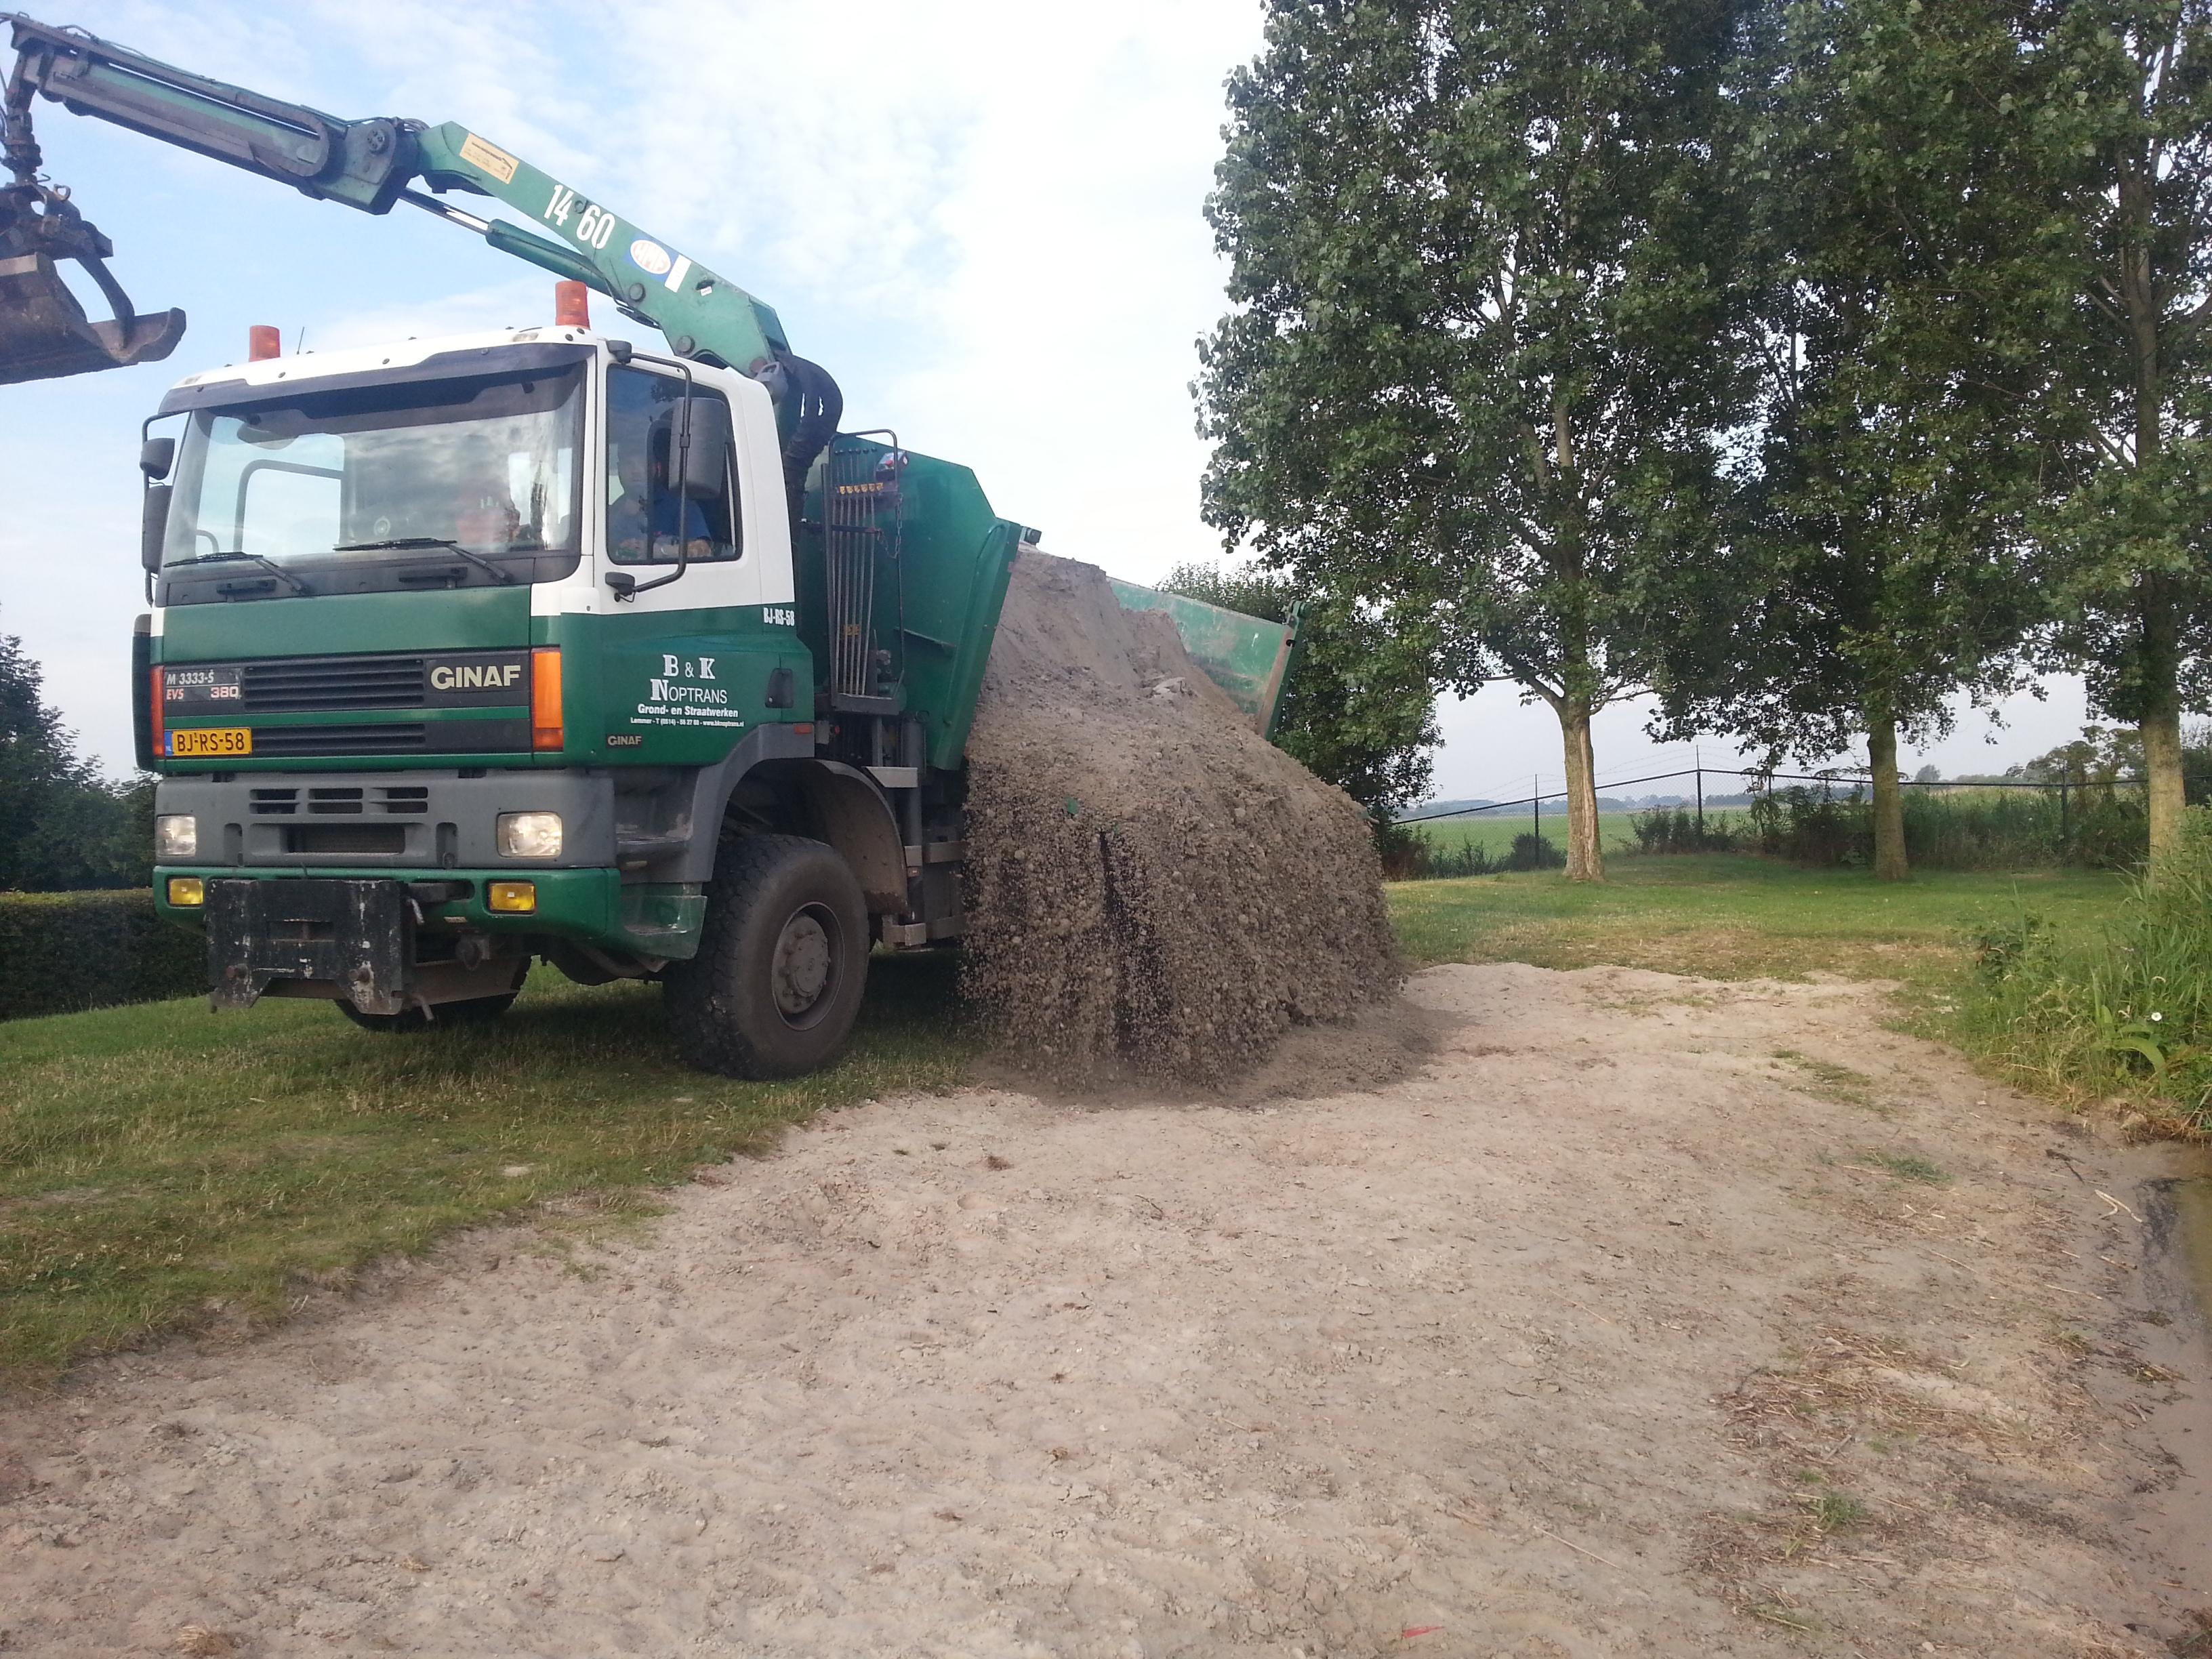 Tuin Zand Afvoeren : Zand meeleveren klantenservice opruimen